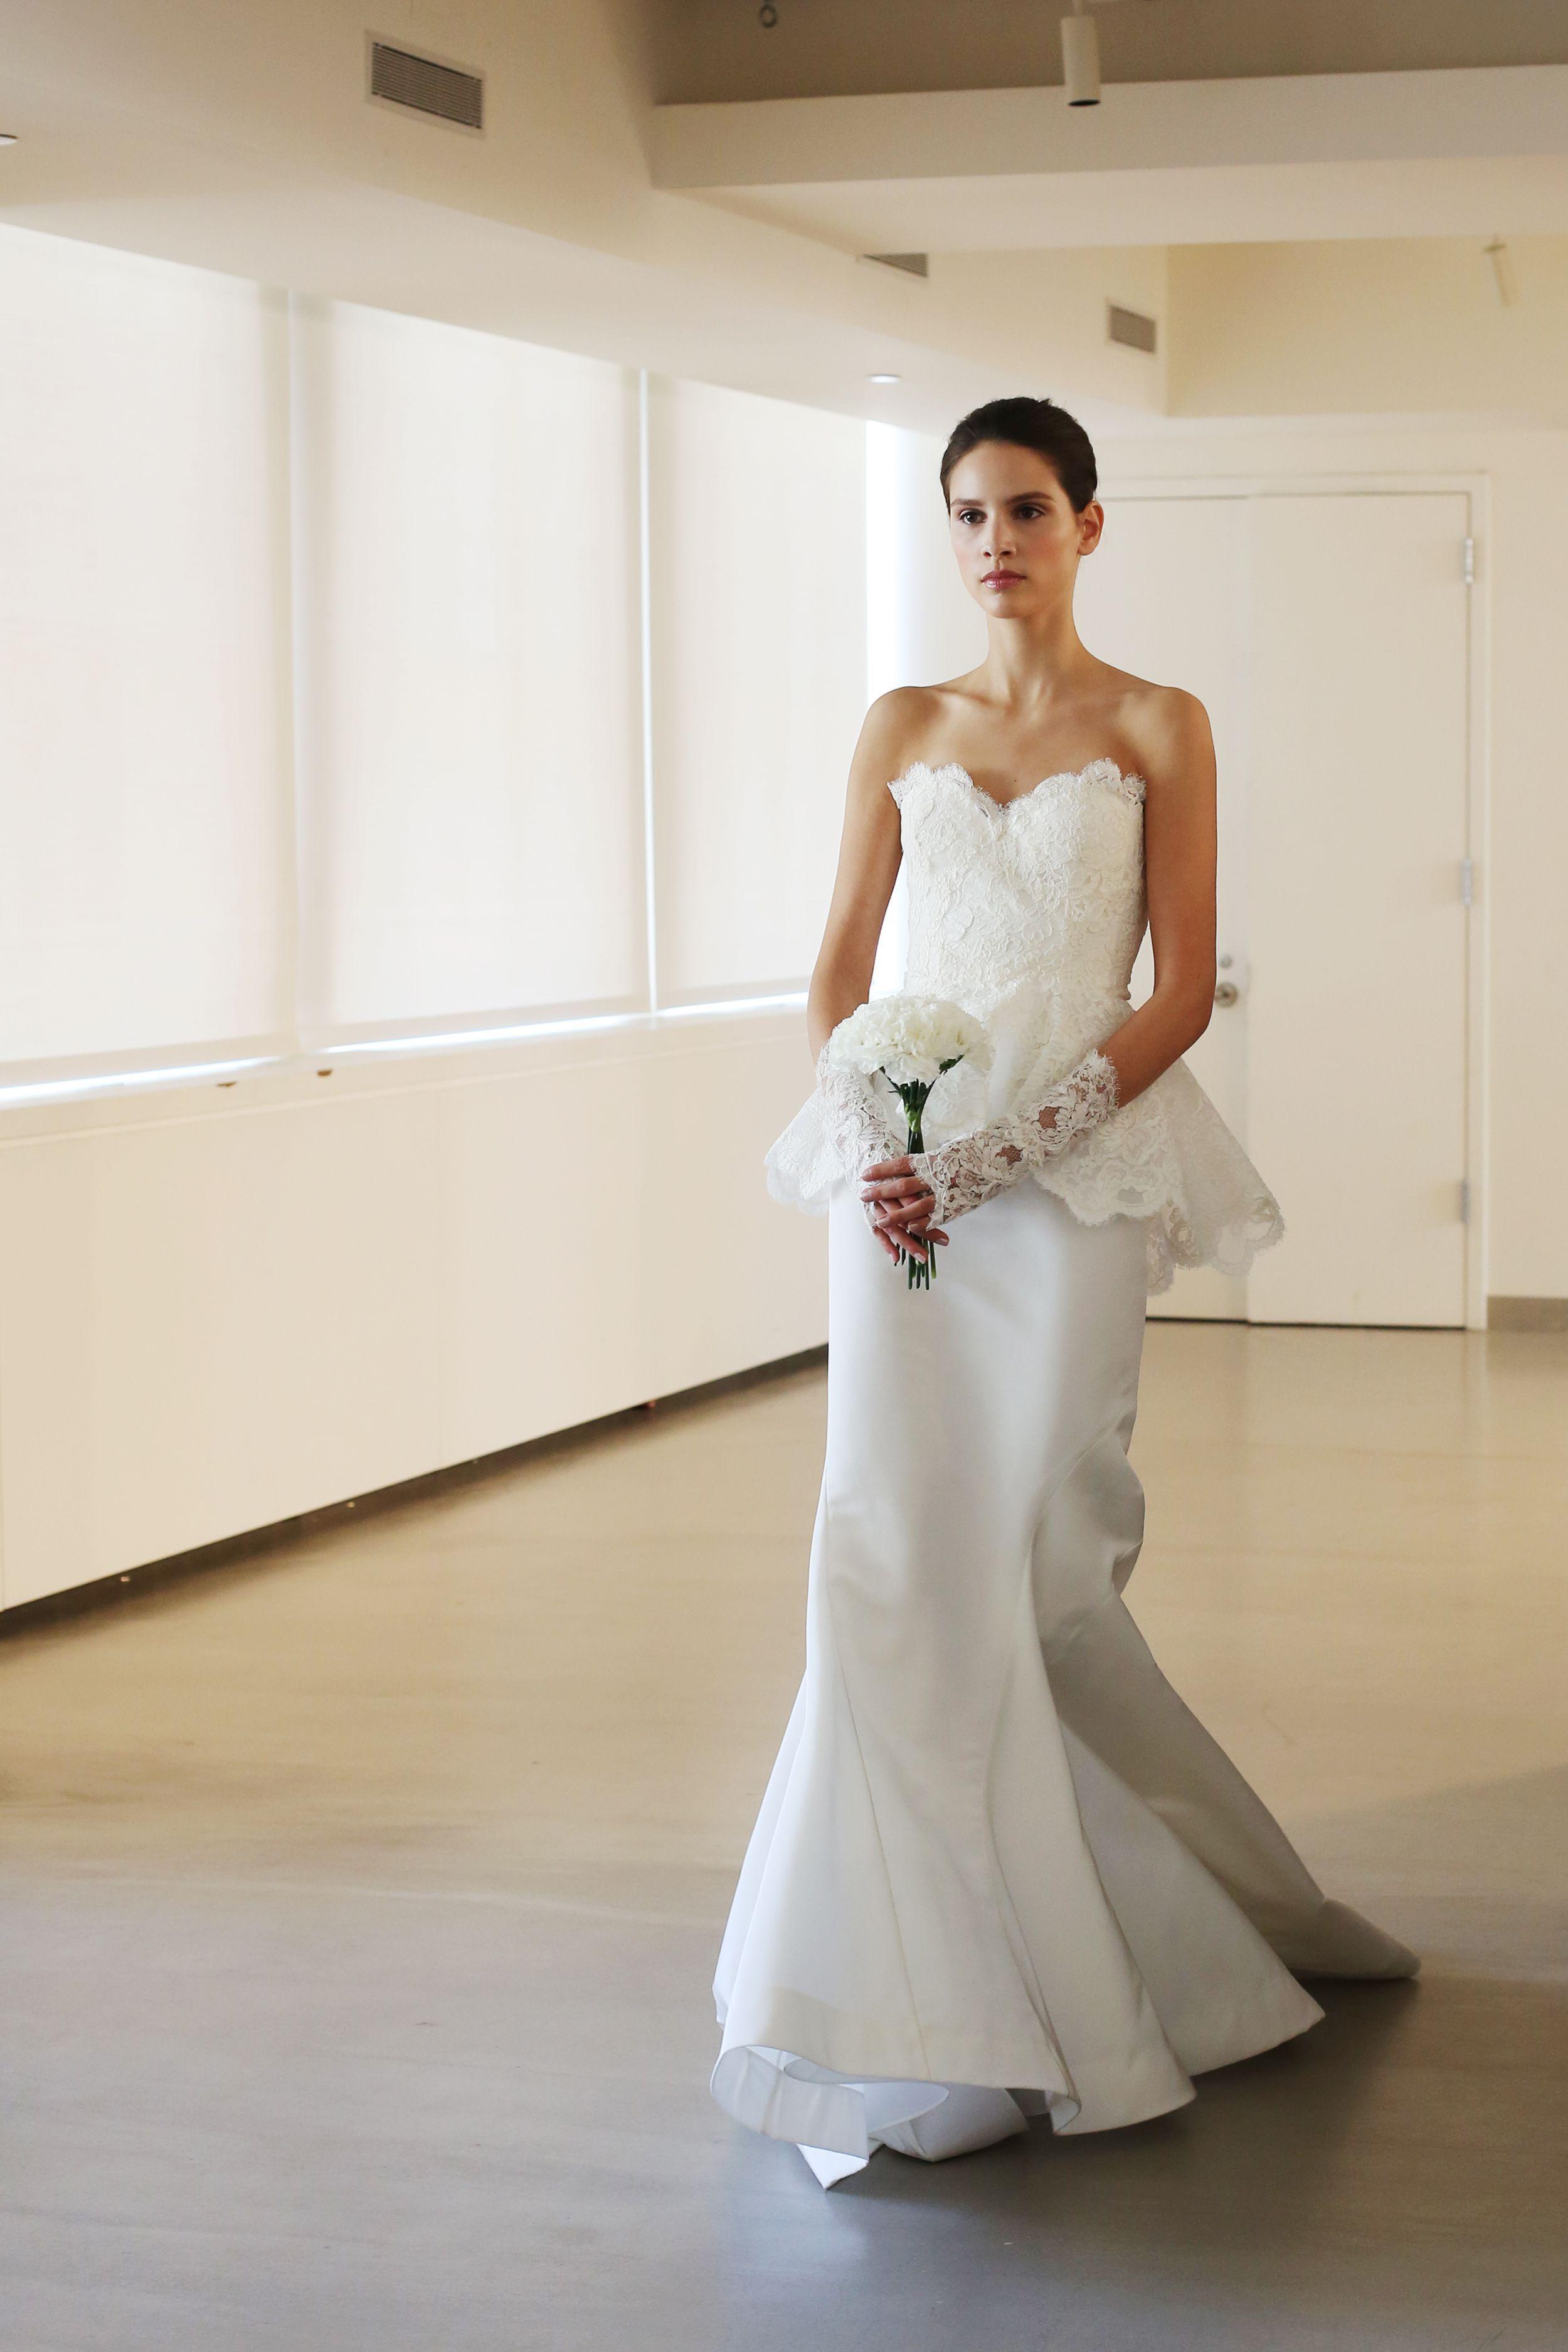 Woodland wedding dress  OSCAR DE LA RENTA BRIDAL   PHOTO BY Natasha S Jahangir